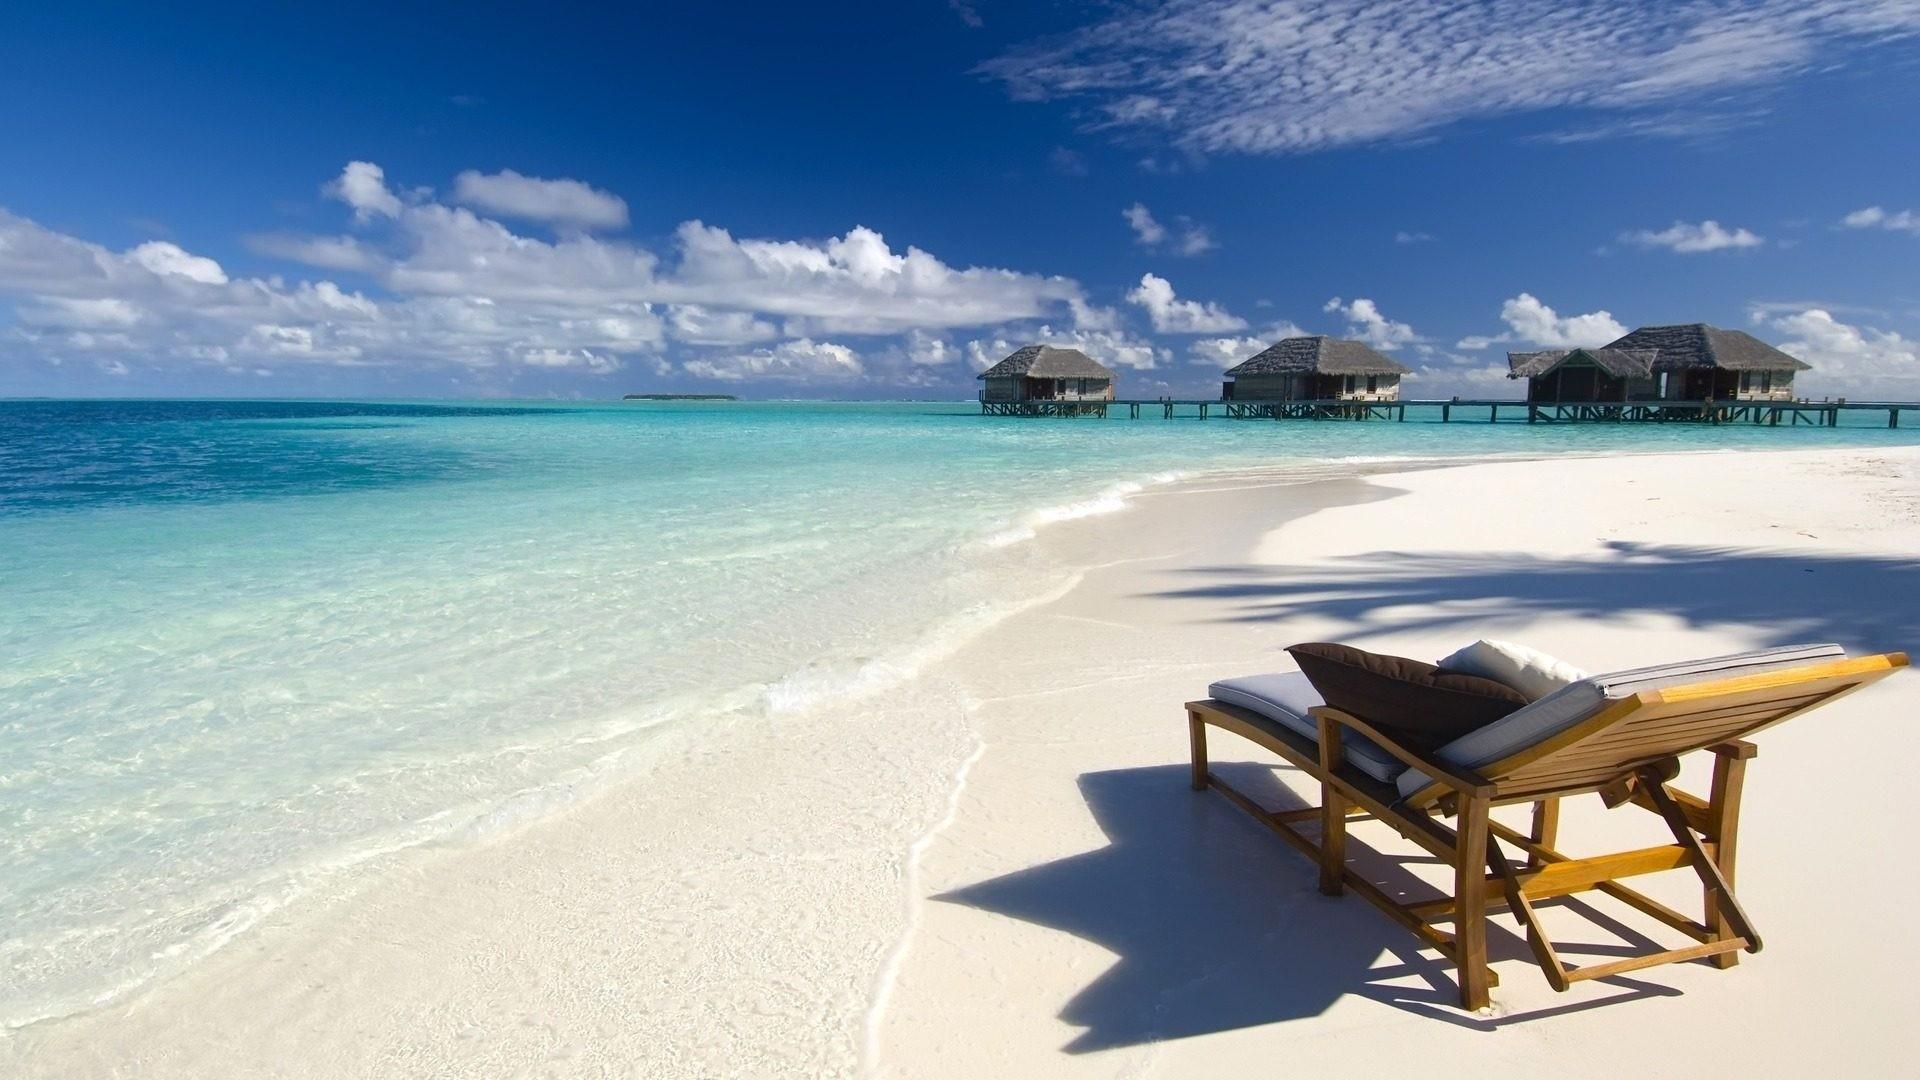 … Category: Beach Wallpaper Page 0 | High Resolution Wallarthd within Wallpaper  Beach …